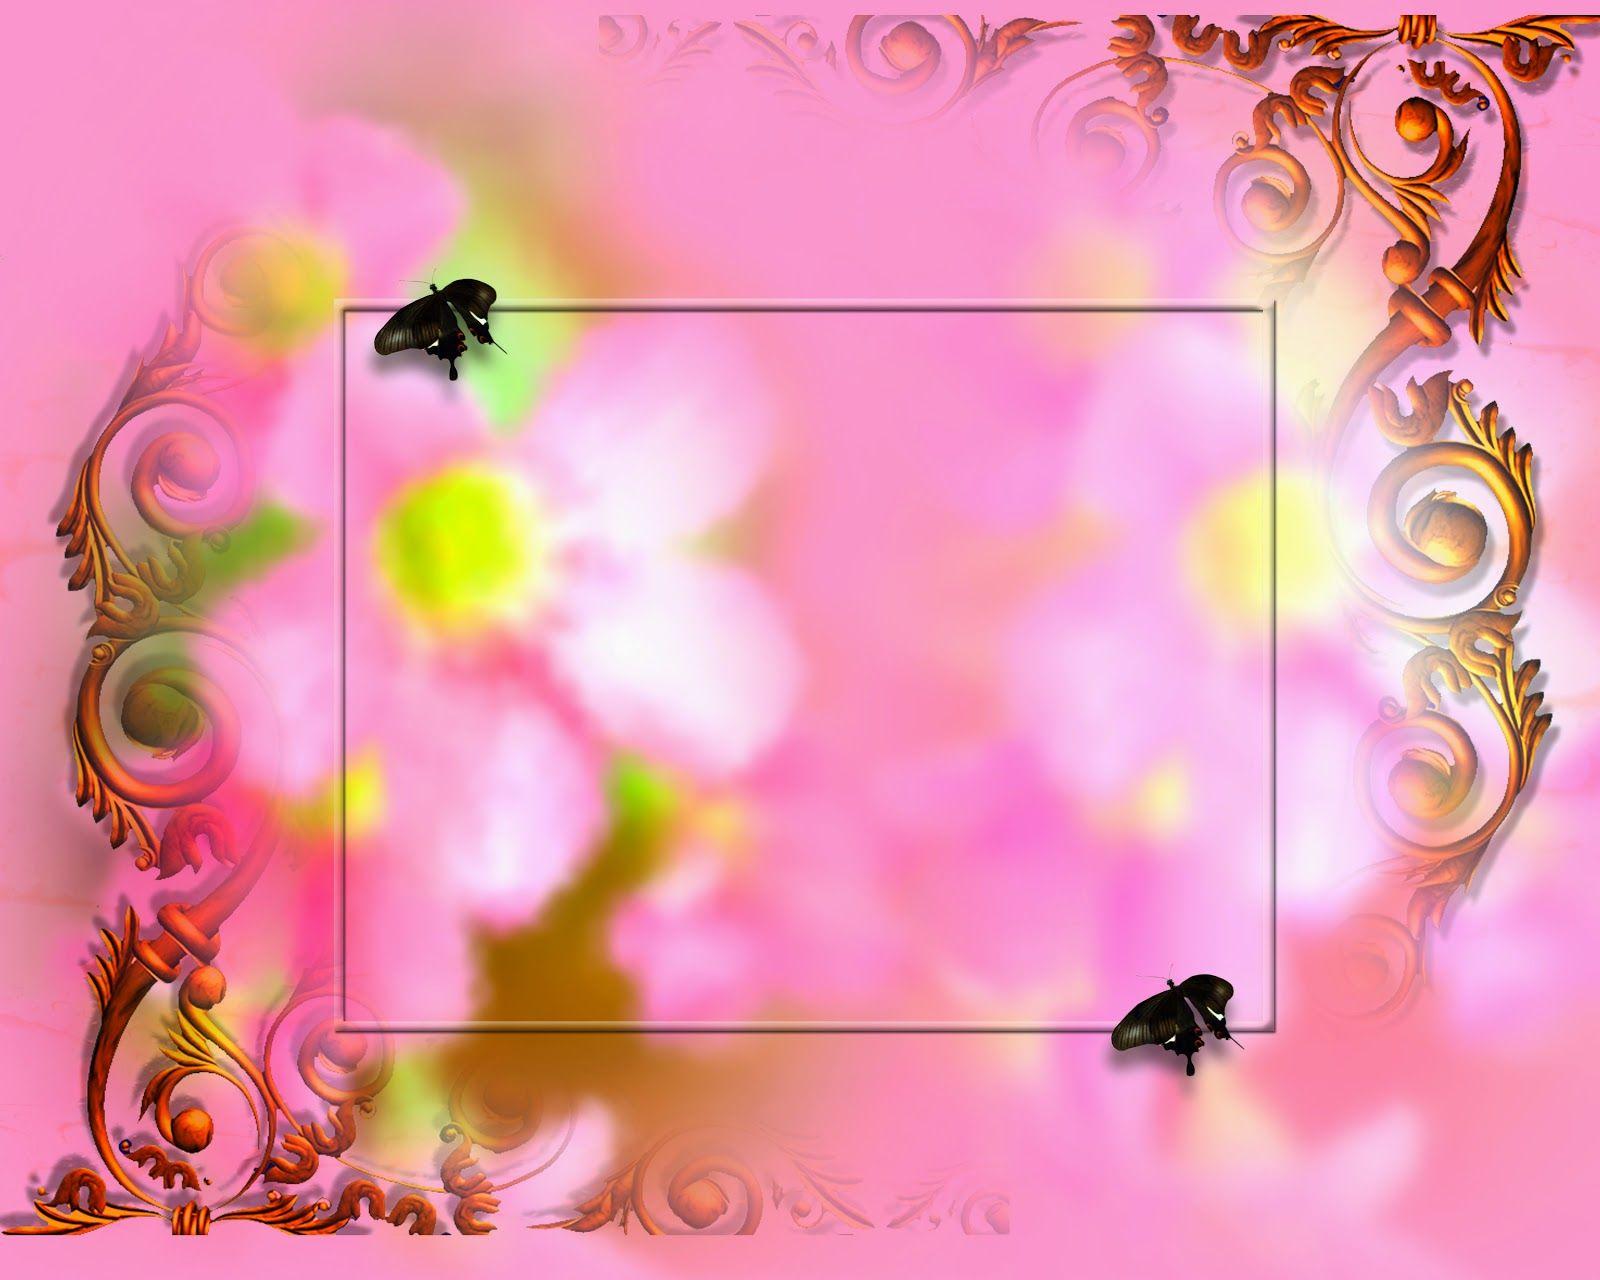 Karizma album hd joy studio design gallery best design - Wedding Background Hd Psd Files 12x36 And 12x30 Luckystudio4u Pinterest Wedding Background Weddings And Wedding